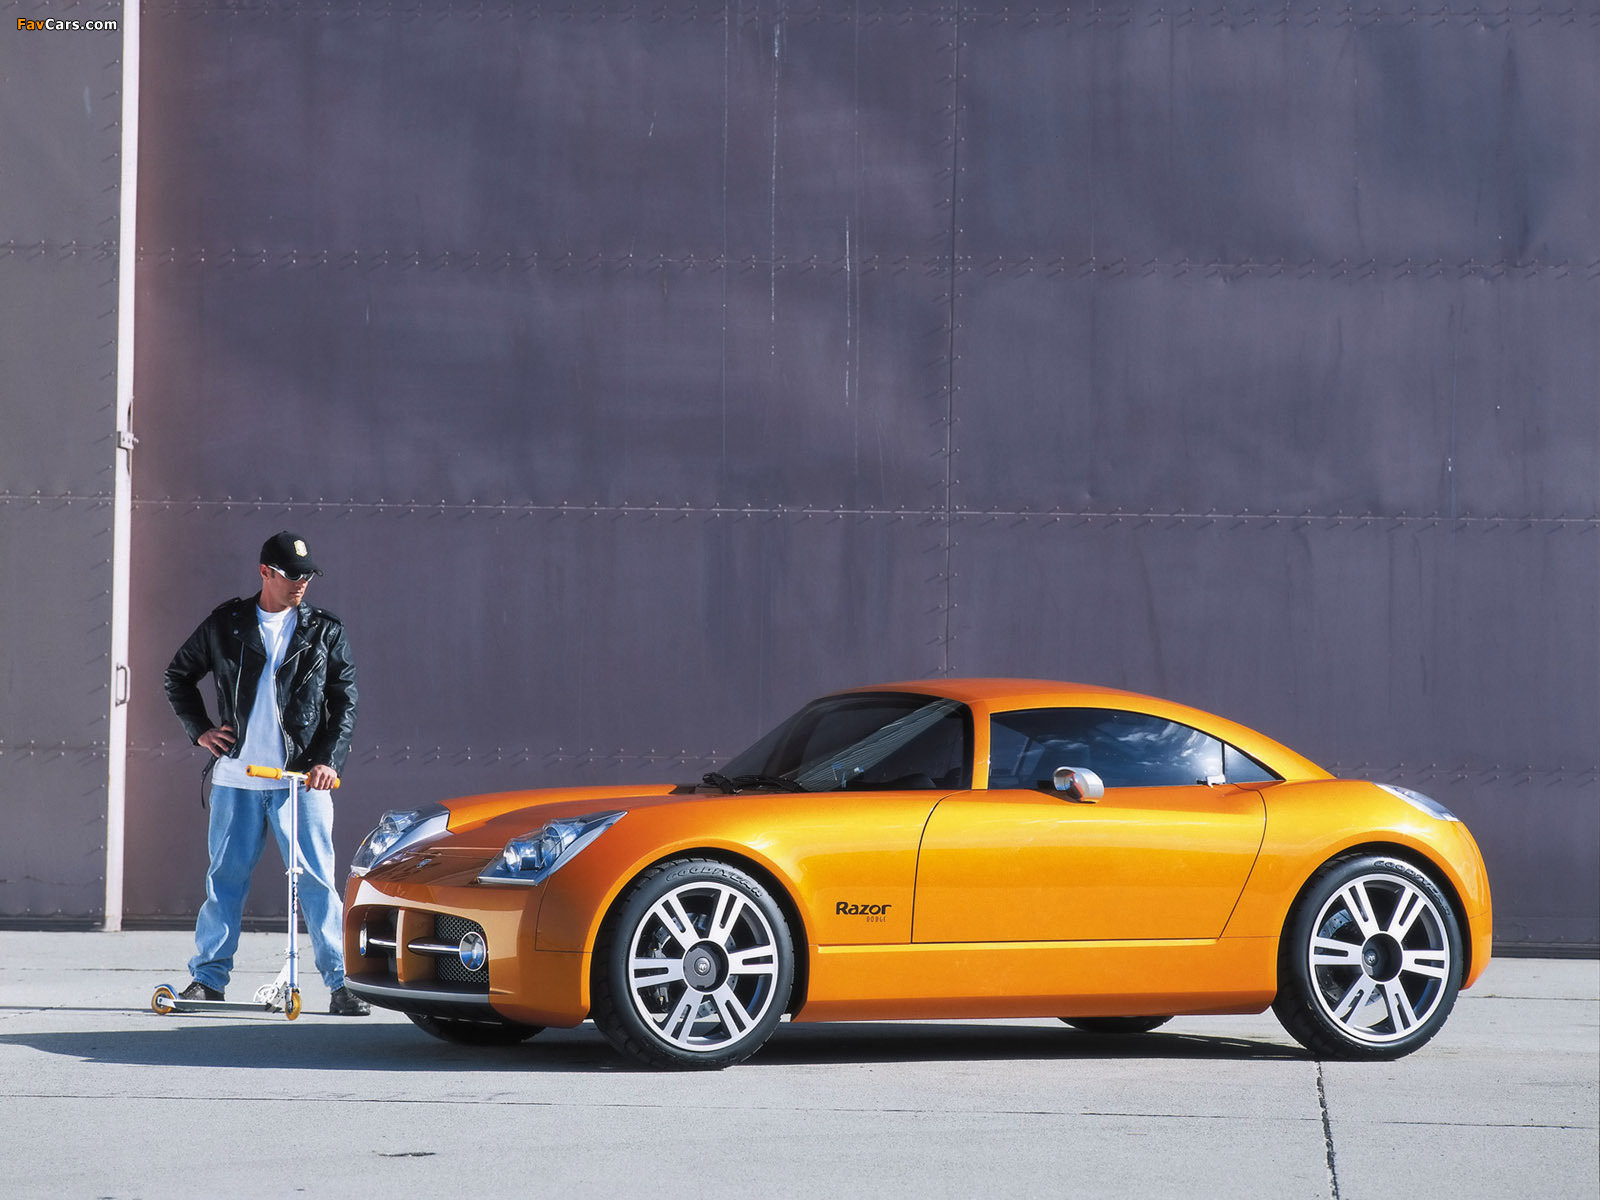 Dodge Razor Concept 2002 wallpapers (1600 x 1200)